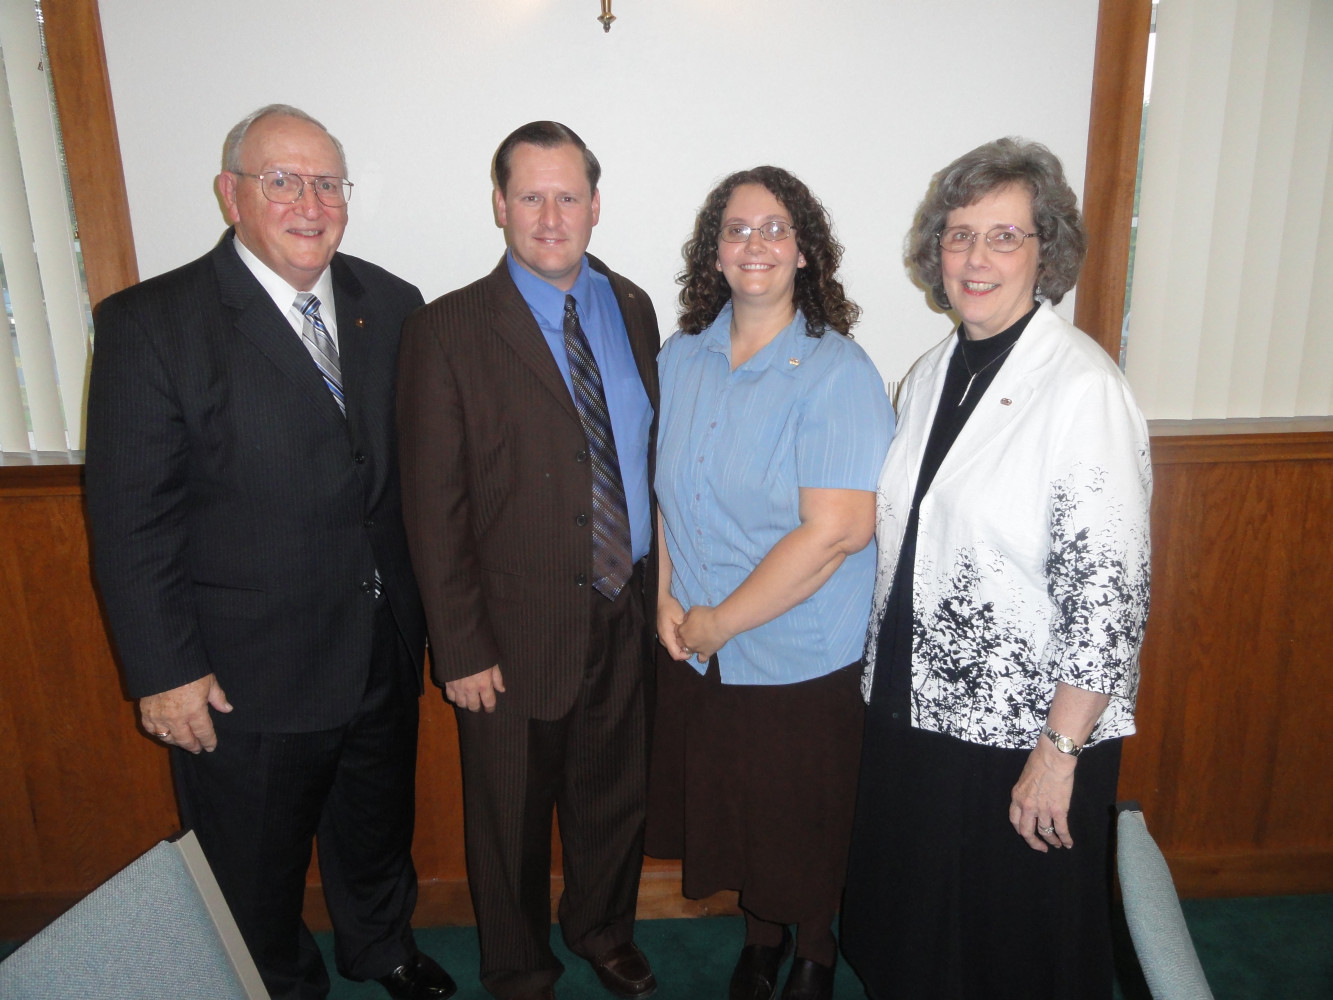 Mr. and Mrs. Bragg  Candidate School 2011